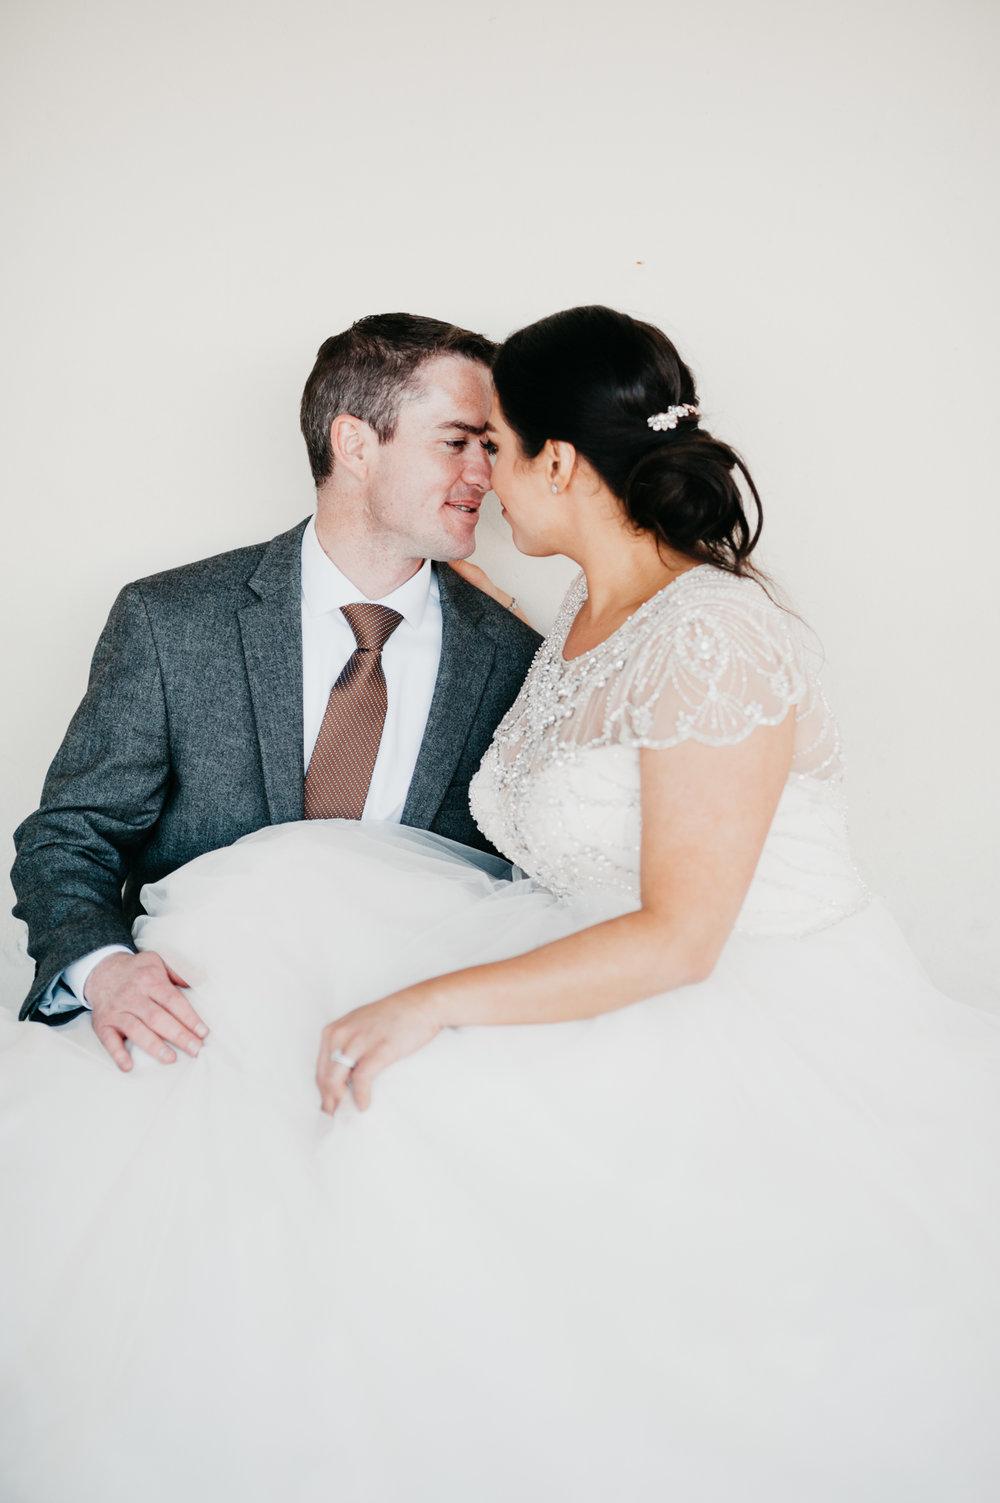 monterey, CA Big sur California Coast adventerous wedding elopment intimate wedding photographer